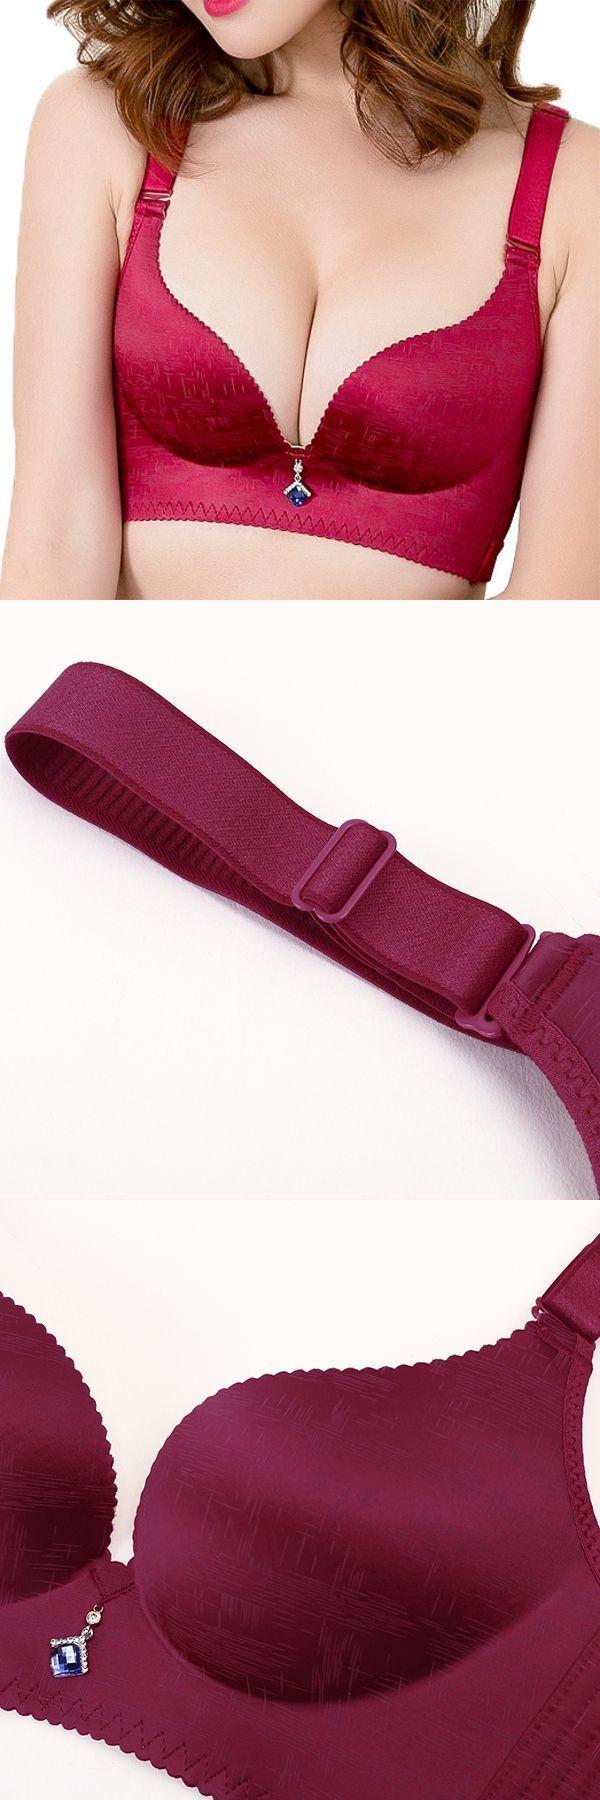 28d5f50302 Bra open in fashion show plus size smooth plunge wireless seamless  adjustable gather bras  fashion  model  no  bra  fashion  tape  no  bra   myanmar…